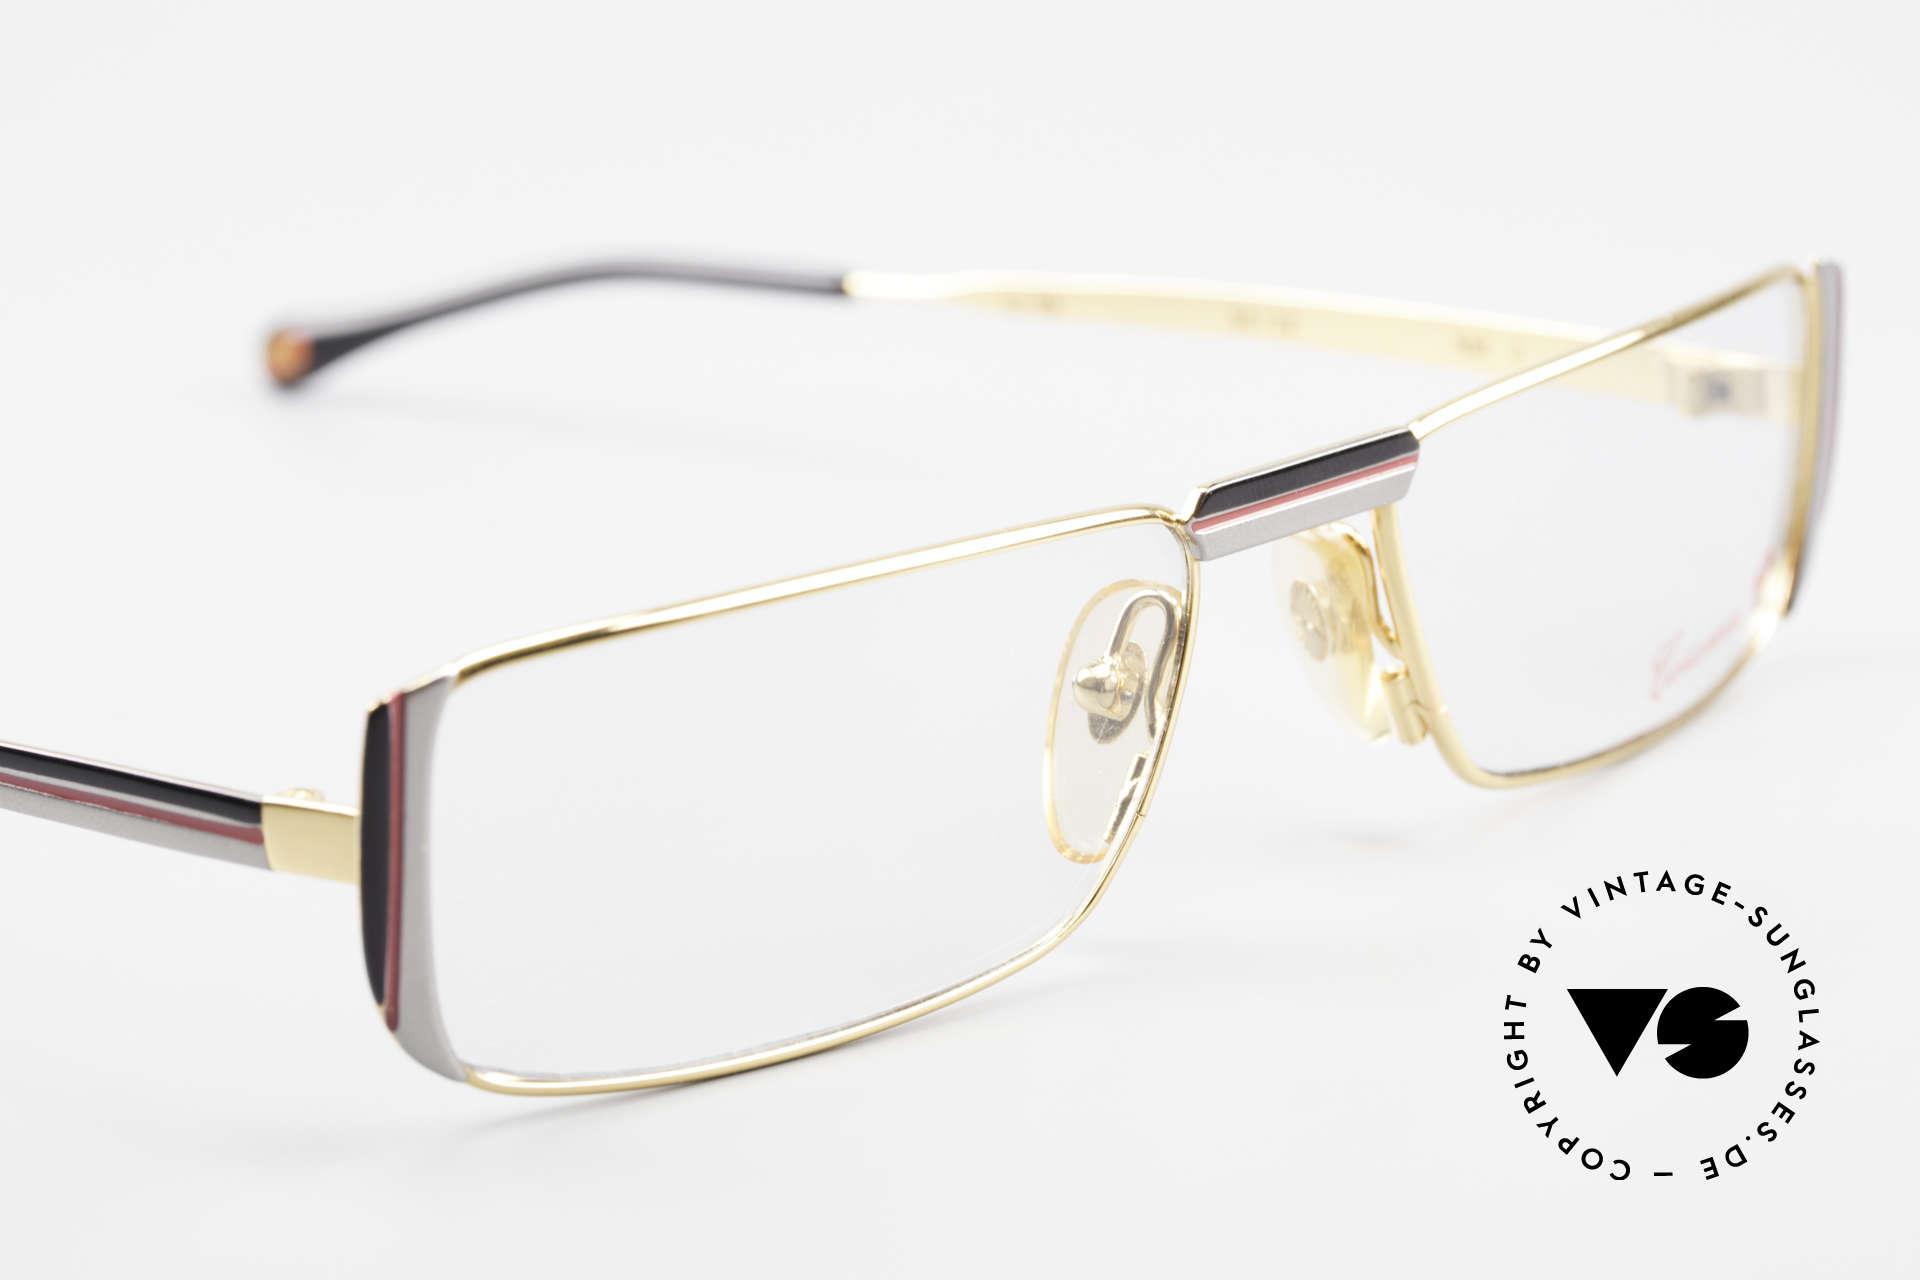 Casanova NM3 Square Reading Eyeglasses 80s, NOS - unworn (like all our vintage Casanova frames), Made for Men and Women